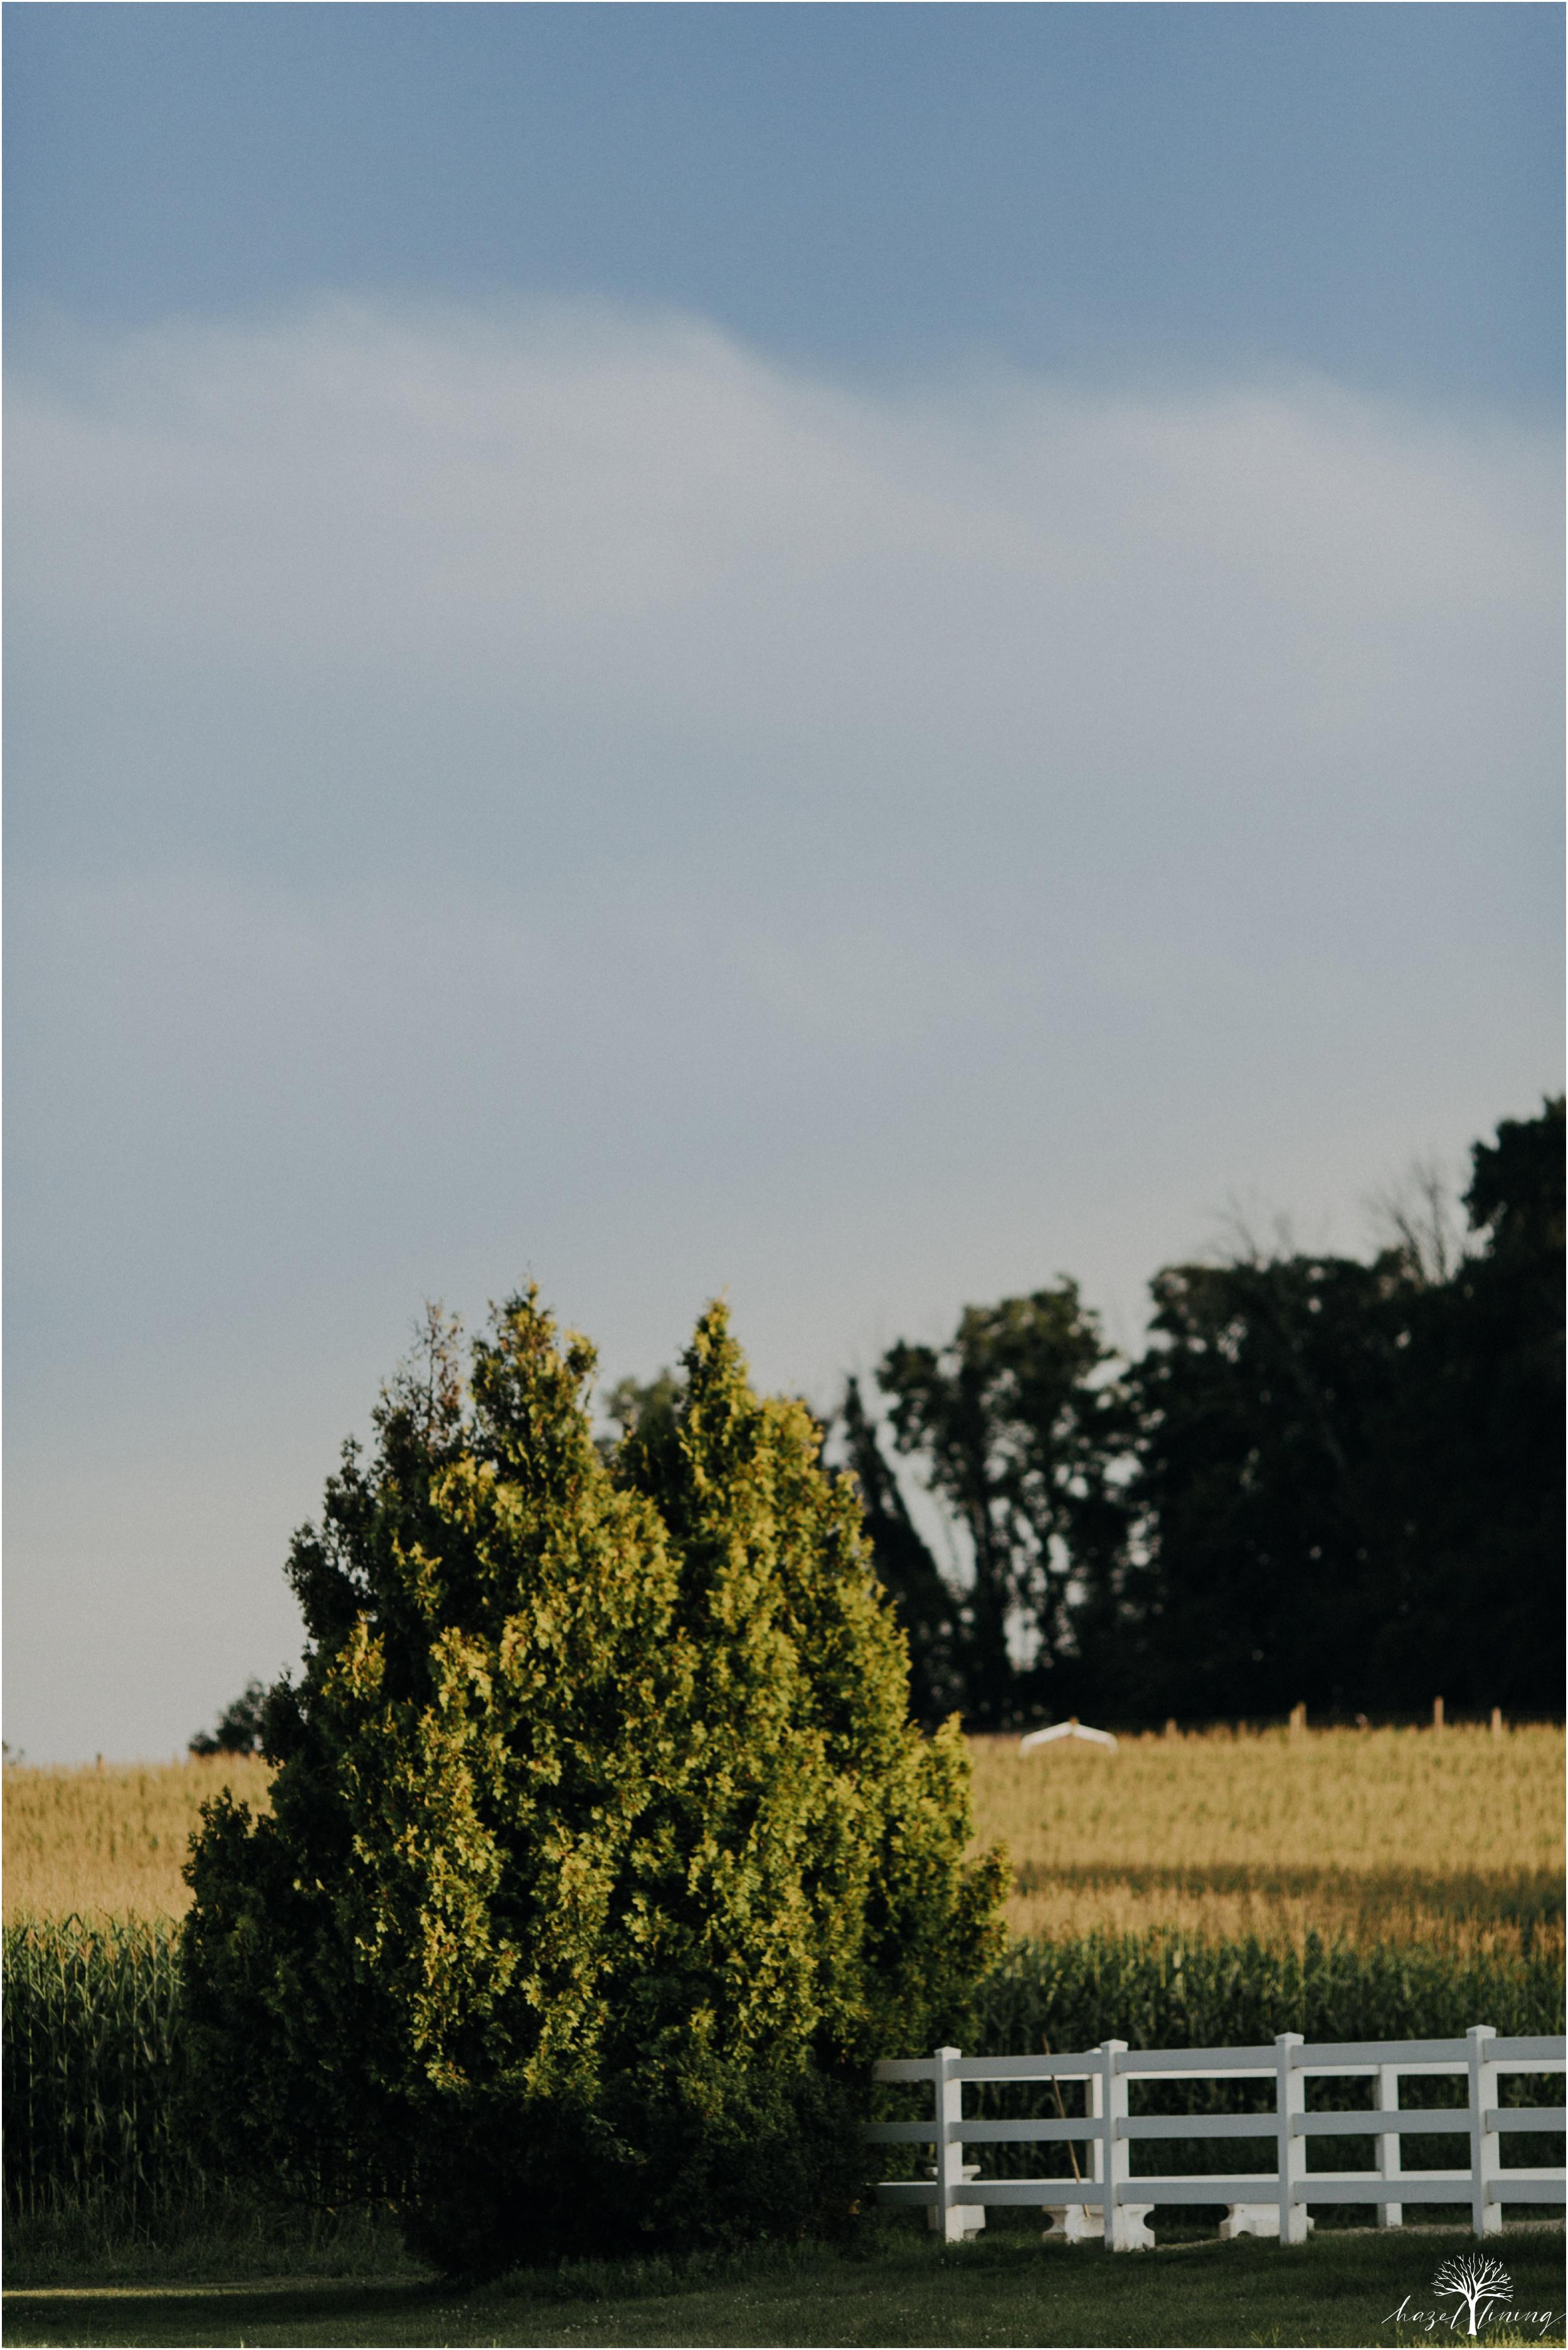 taylor-adams-and-horse-delaware-valley-university-delval-summer-equestrian-portrait-session-hazel-lining-photography-destination-elopement-wedding-engagement-photography_0001.jpg